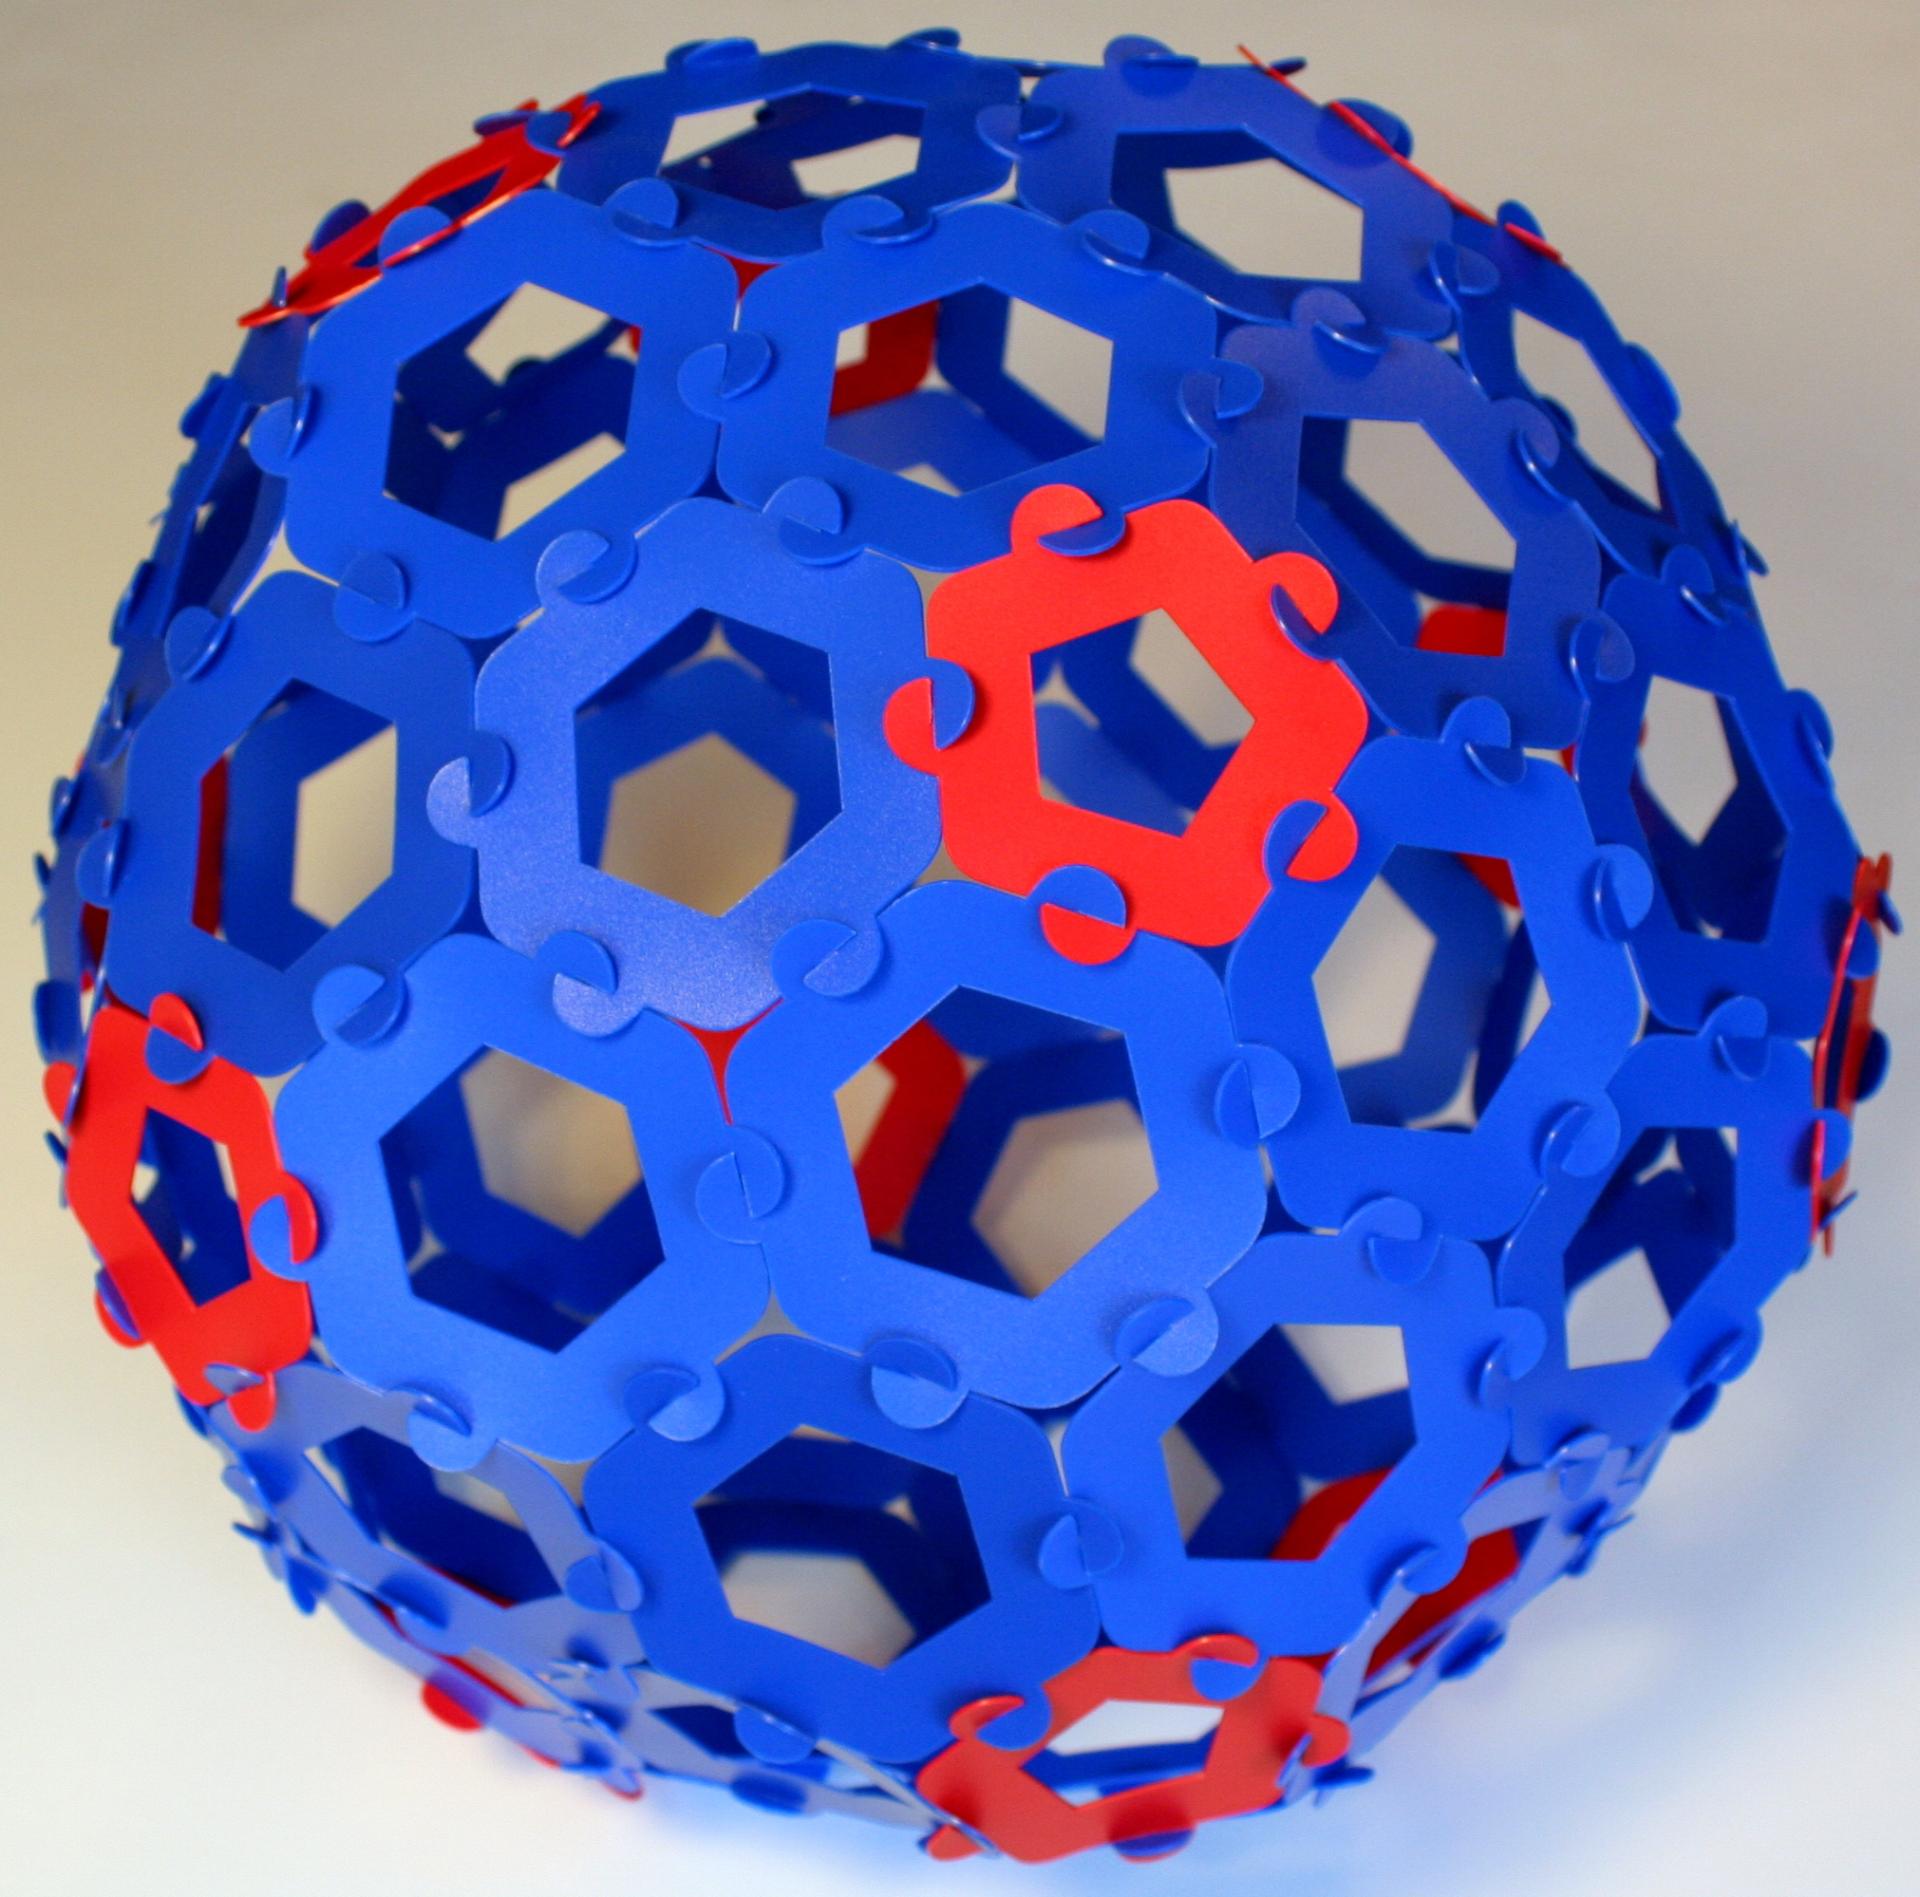 Goldeberg polyhedron G(2,1)